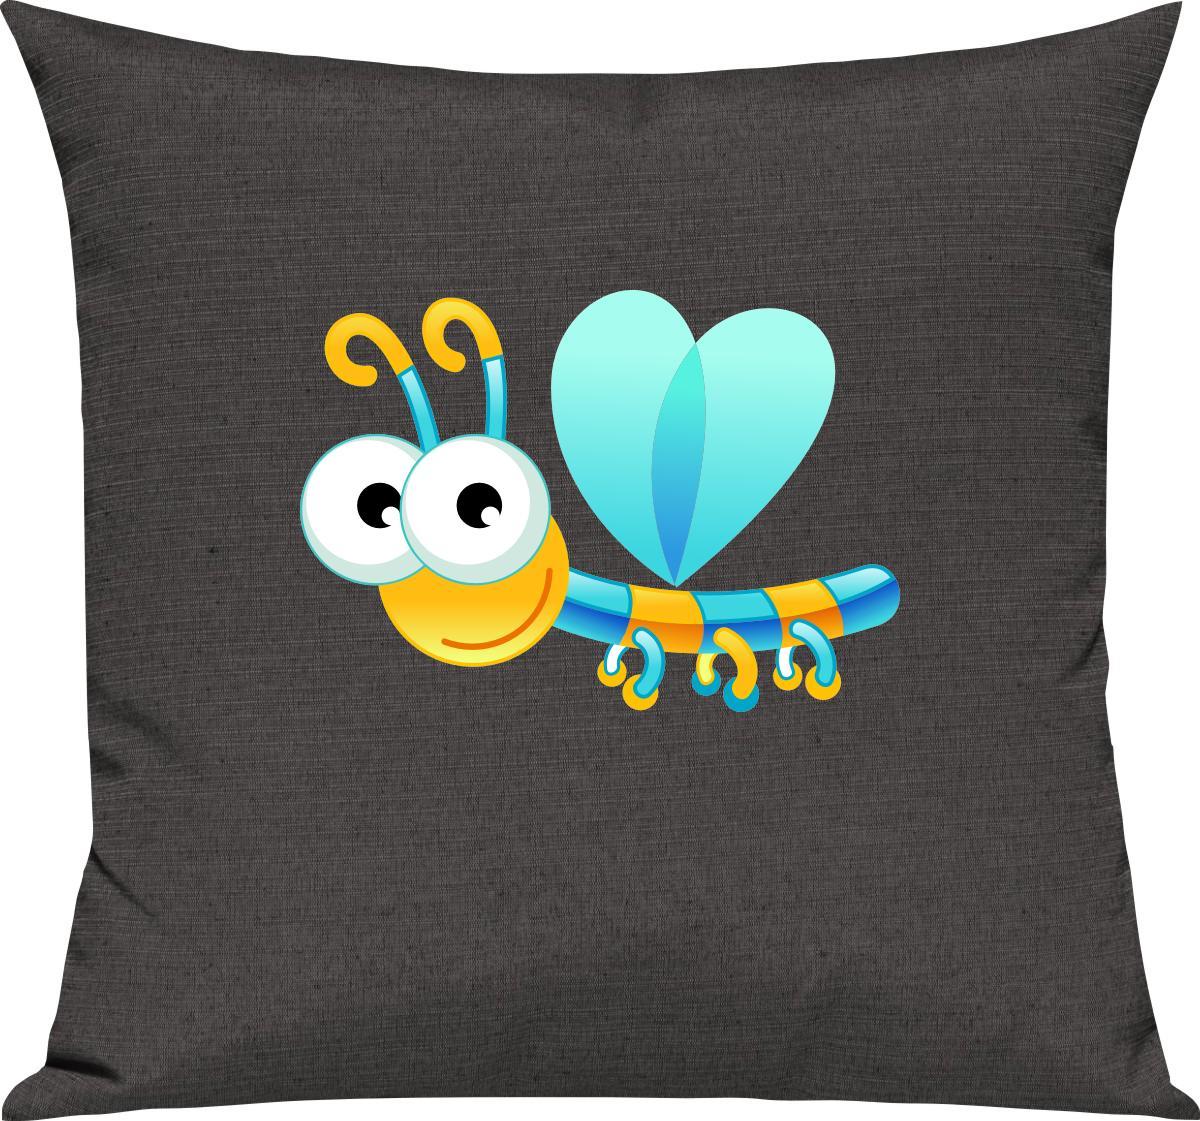 Indexbild 5 - Kinder Kissen, Libelle Insekt Tiere Tier Natur, Kuschelkissen Couch Deko,